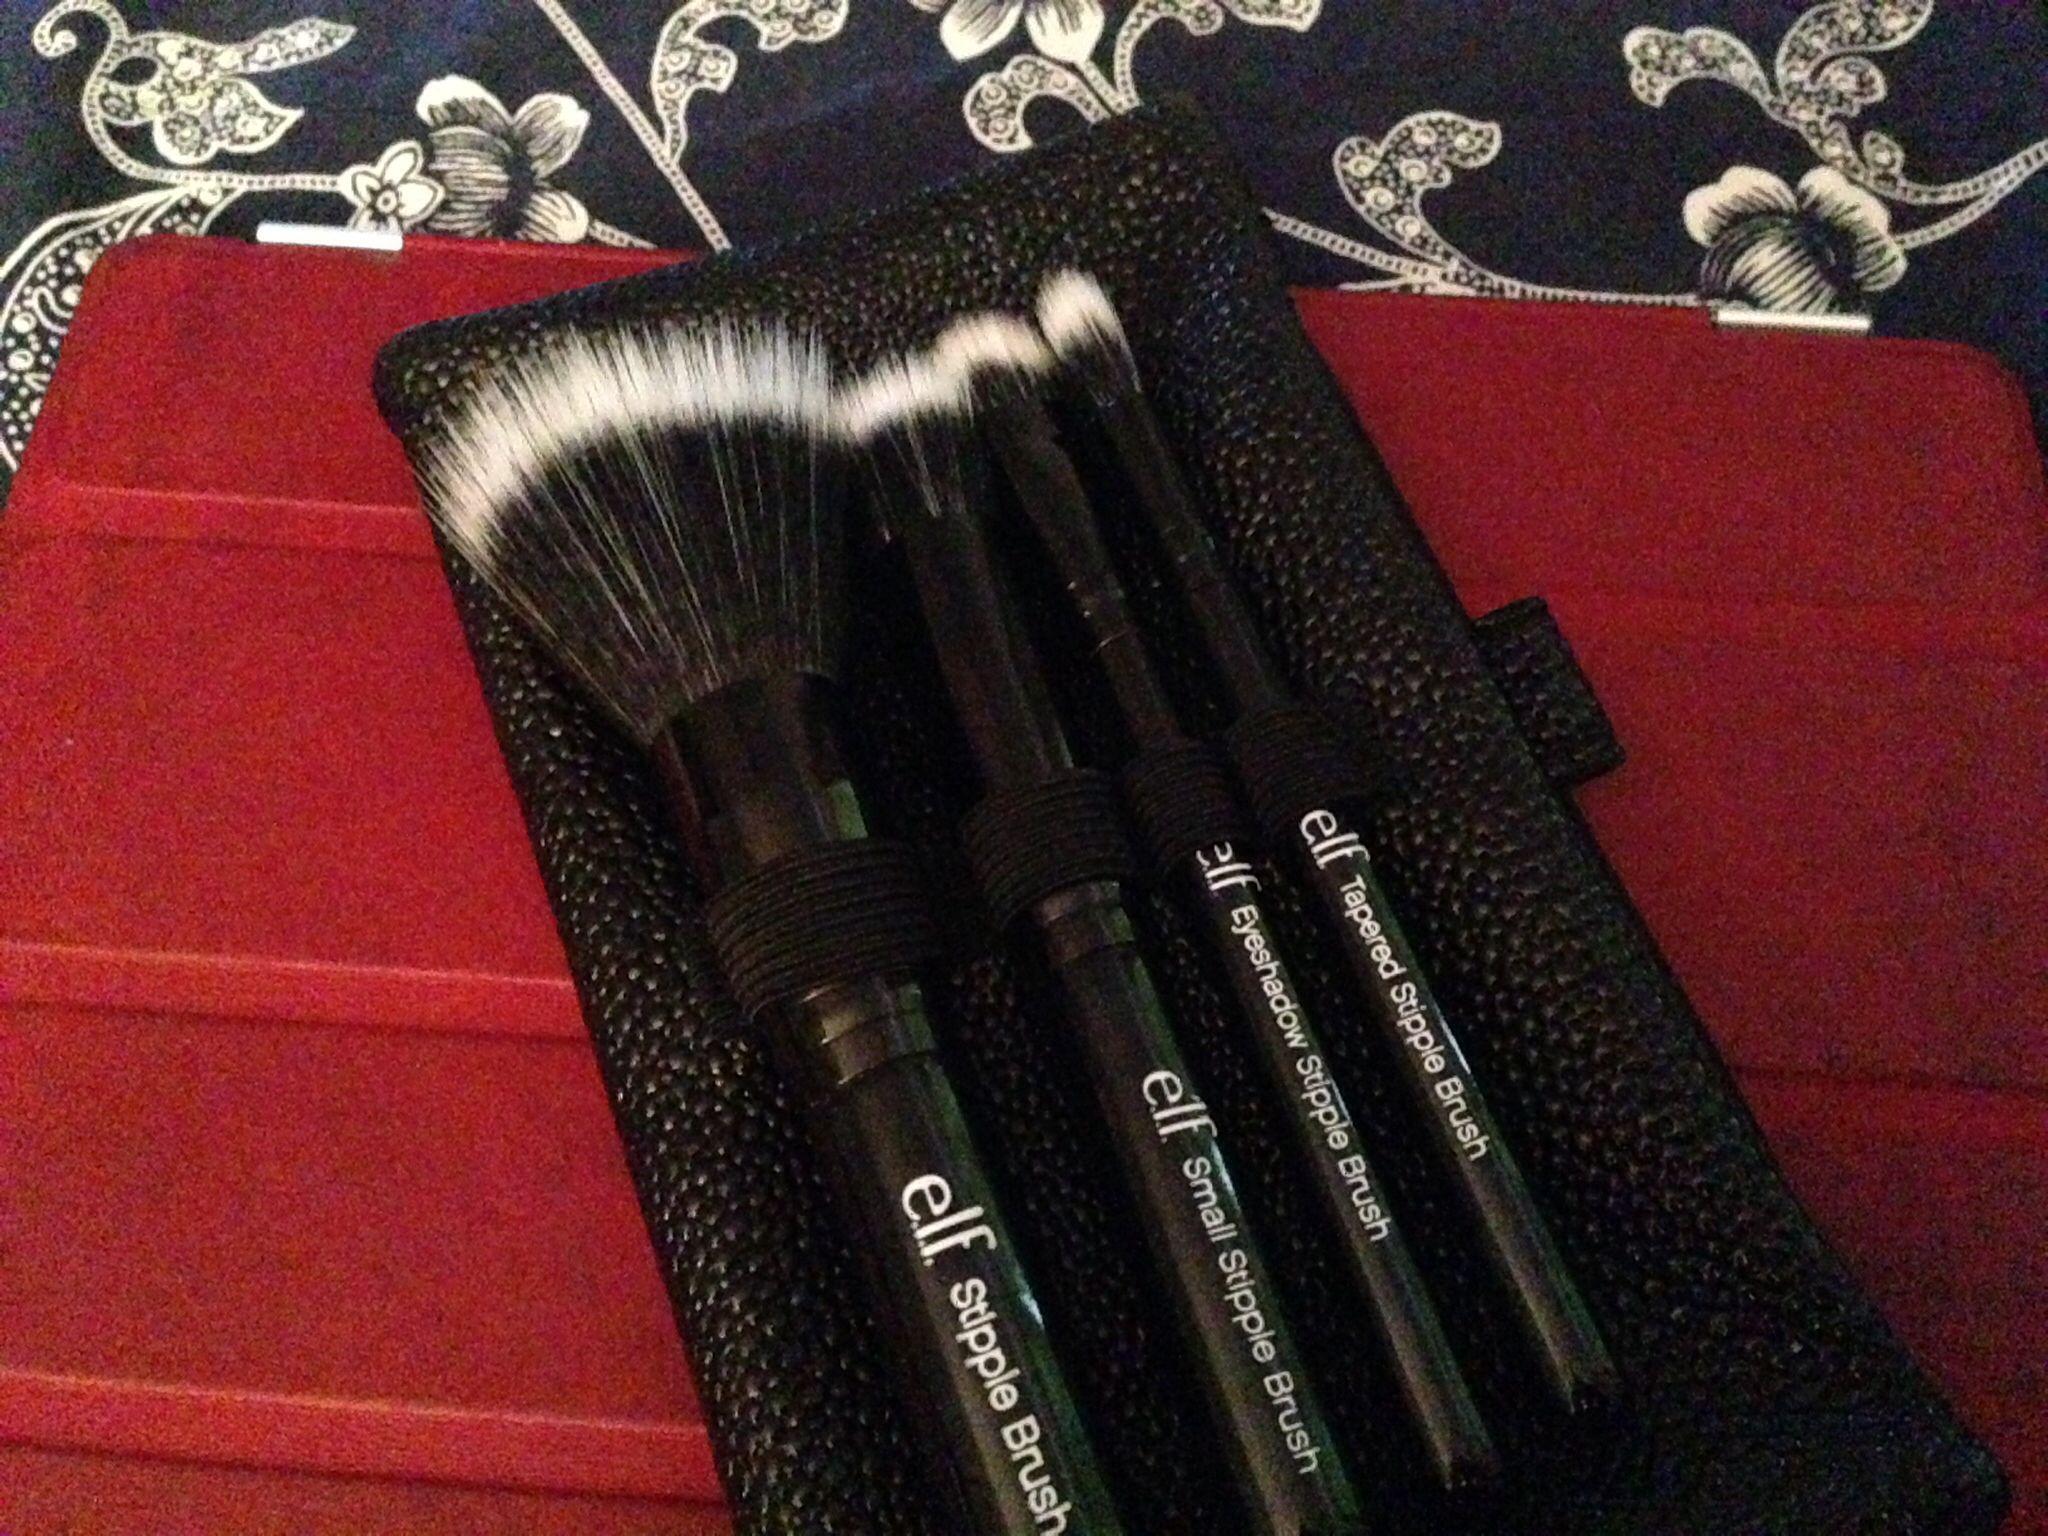 e.l.f Travel size stipple brush set My makeup collection